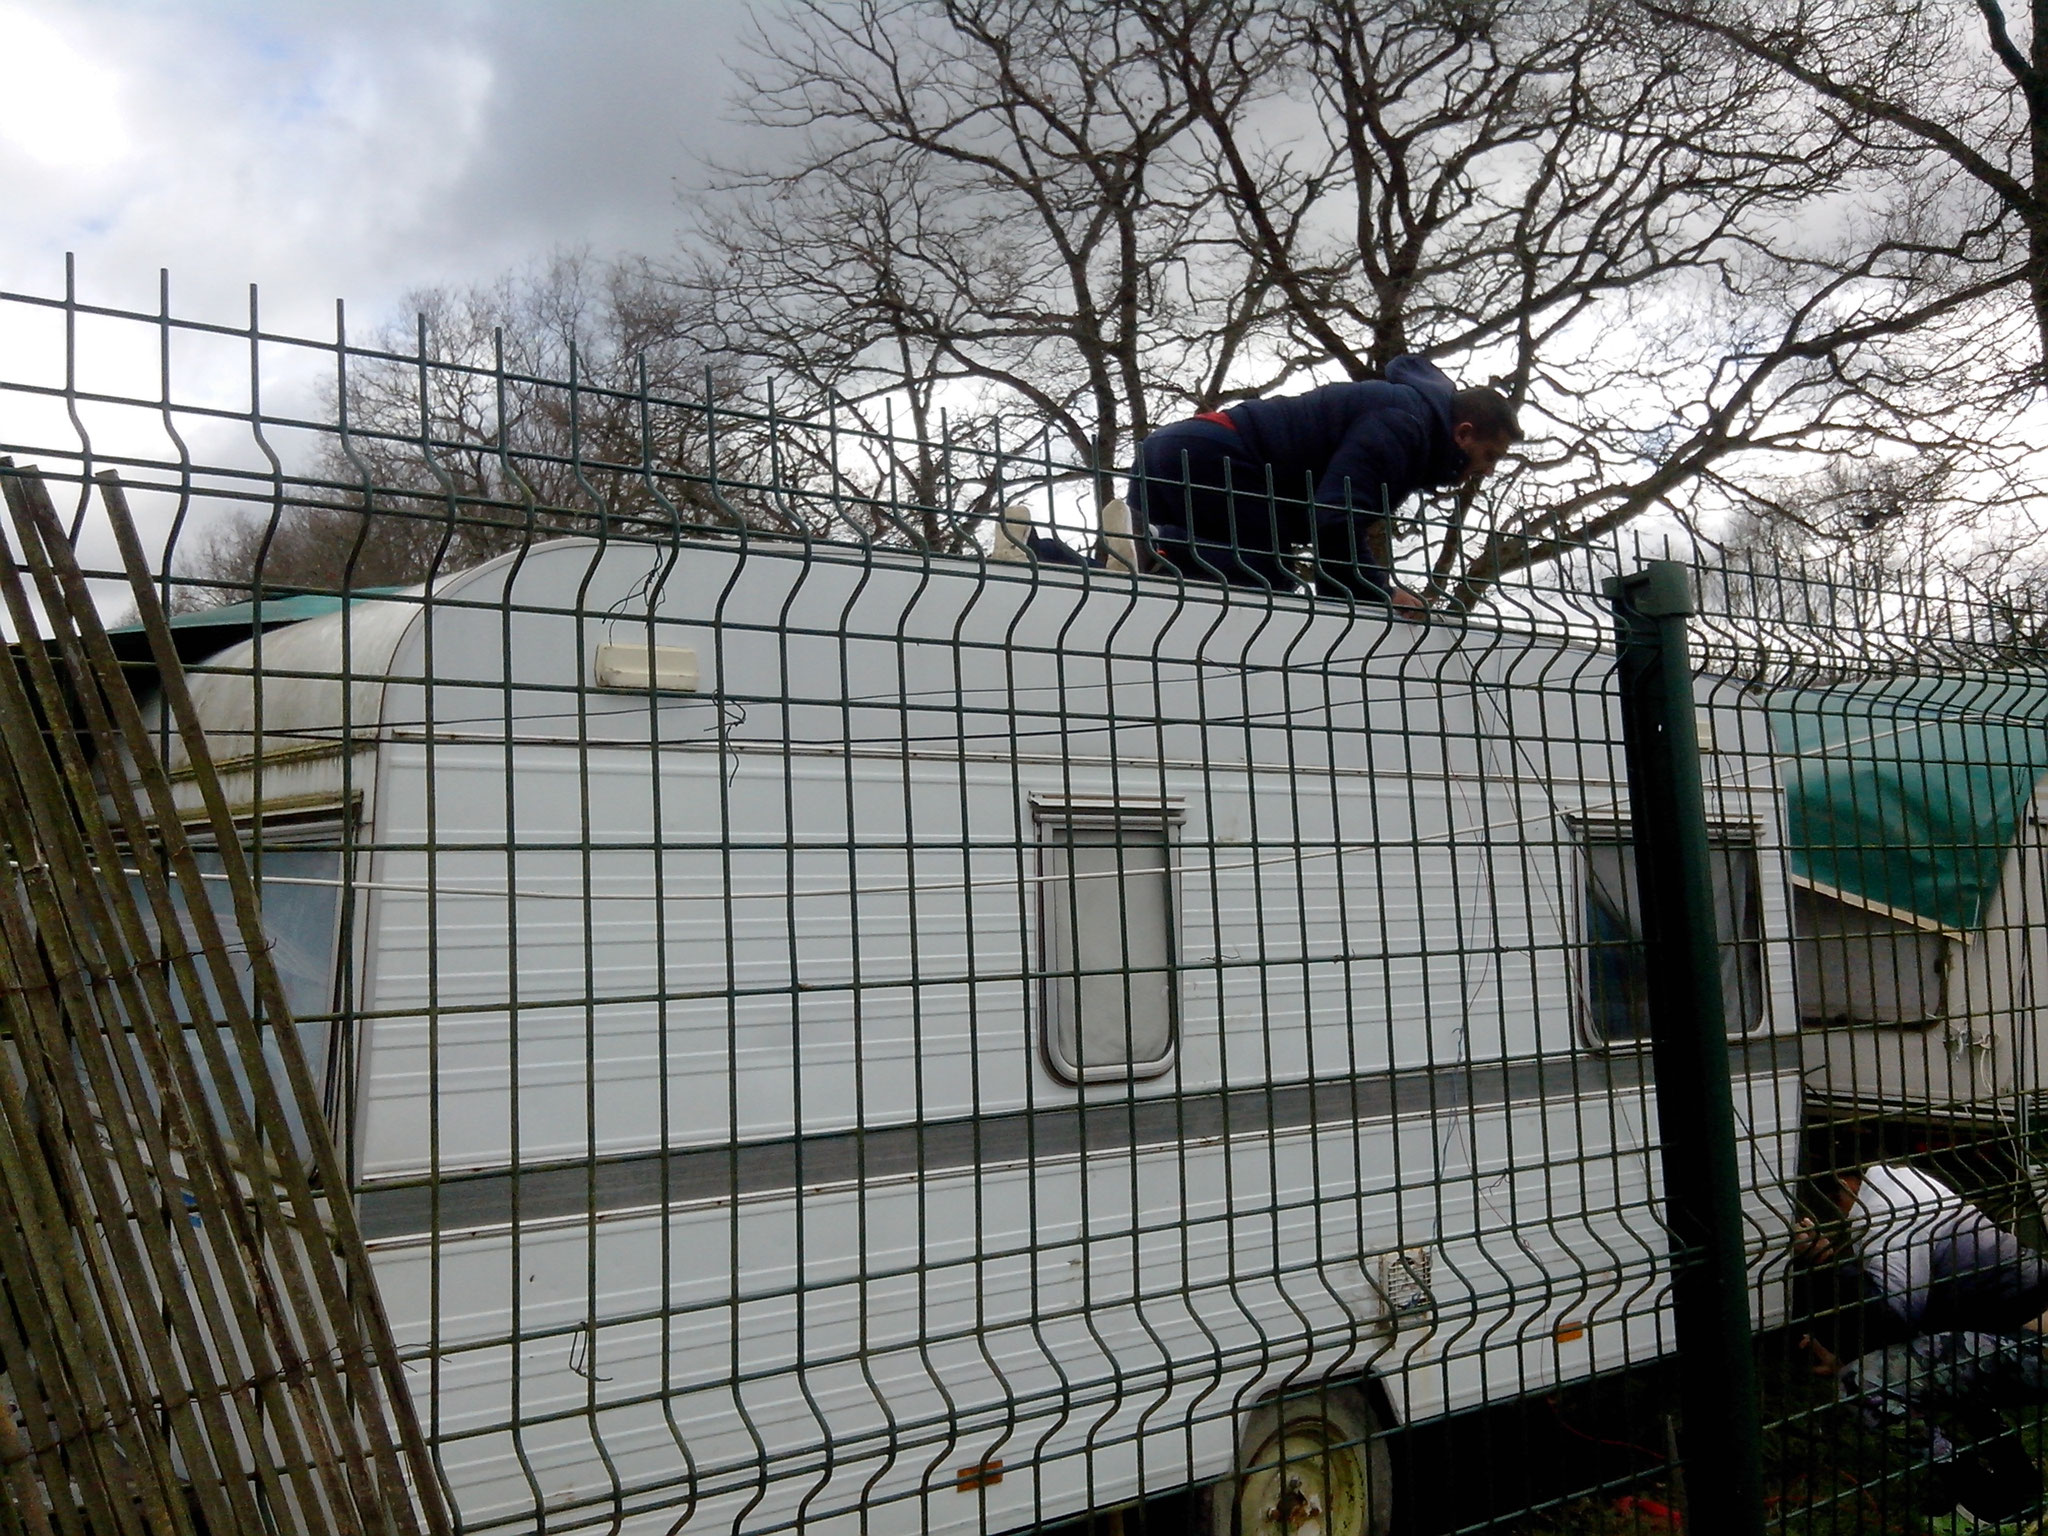 Marinica en haut de sa caravane et Diana en bas retendent les attaches